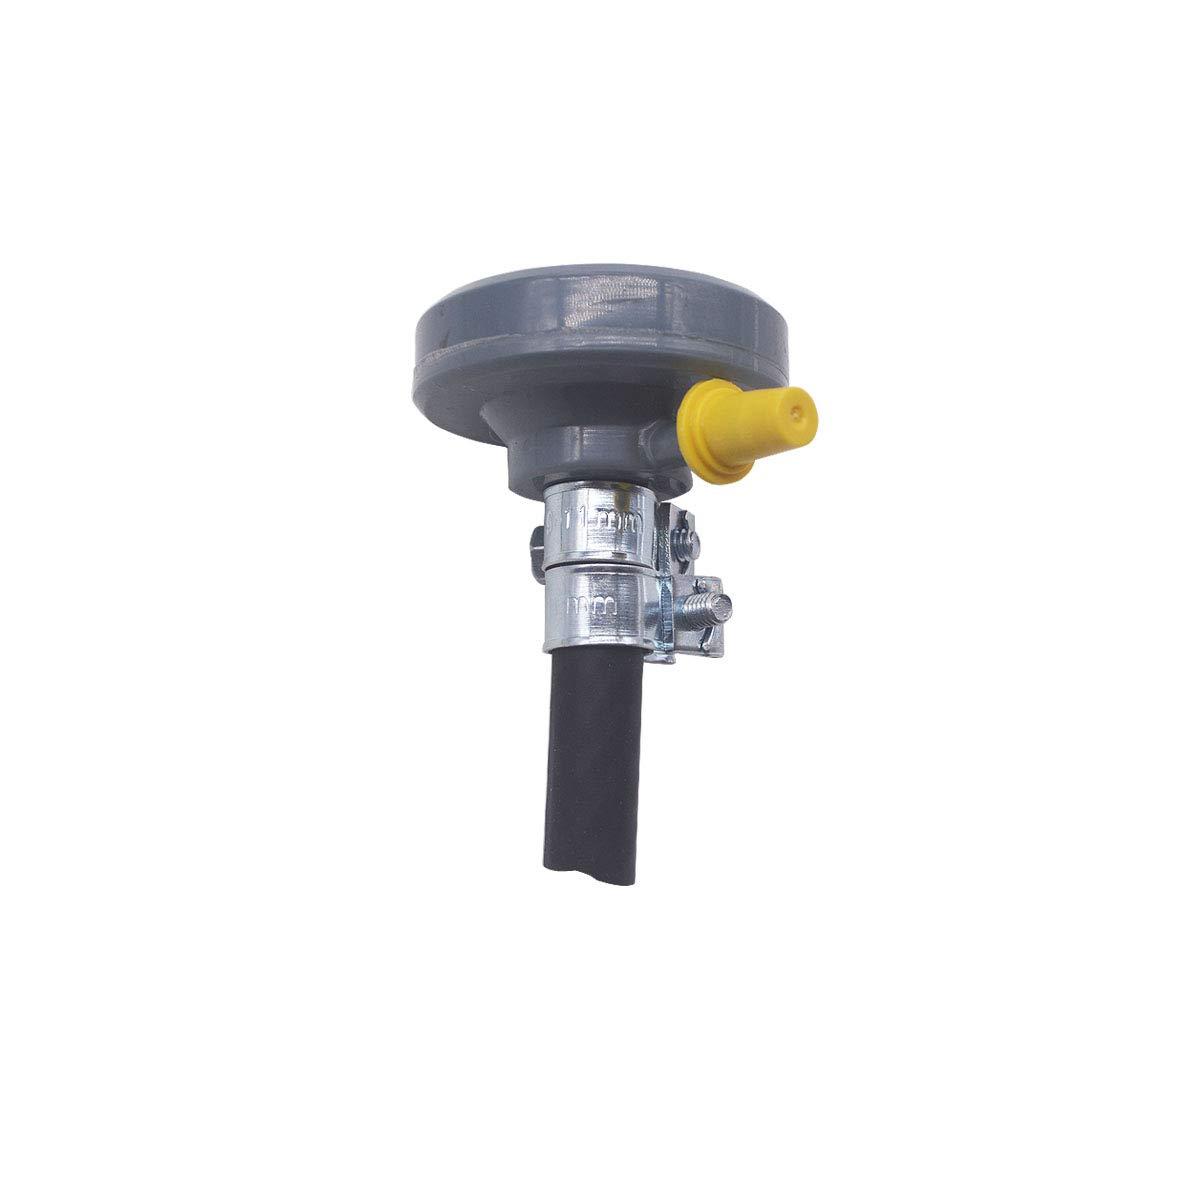 Heater Fuel Dosing Pump damper kit Replacement for Webasto 478814